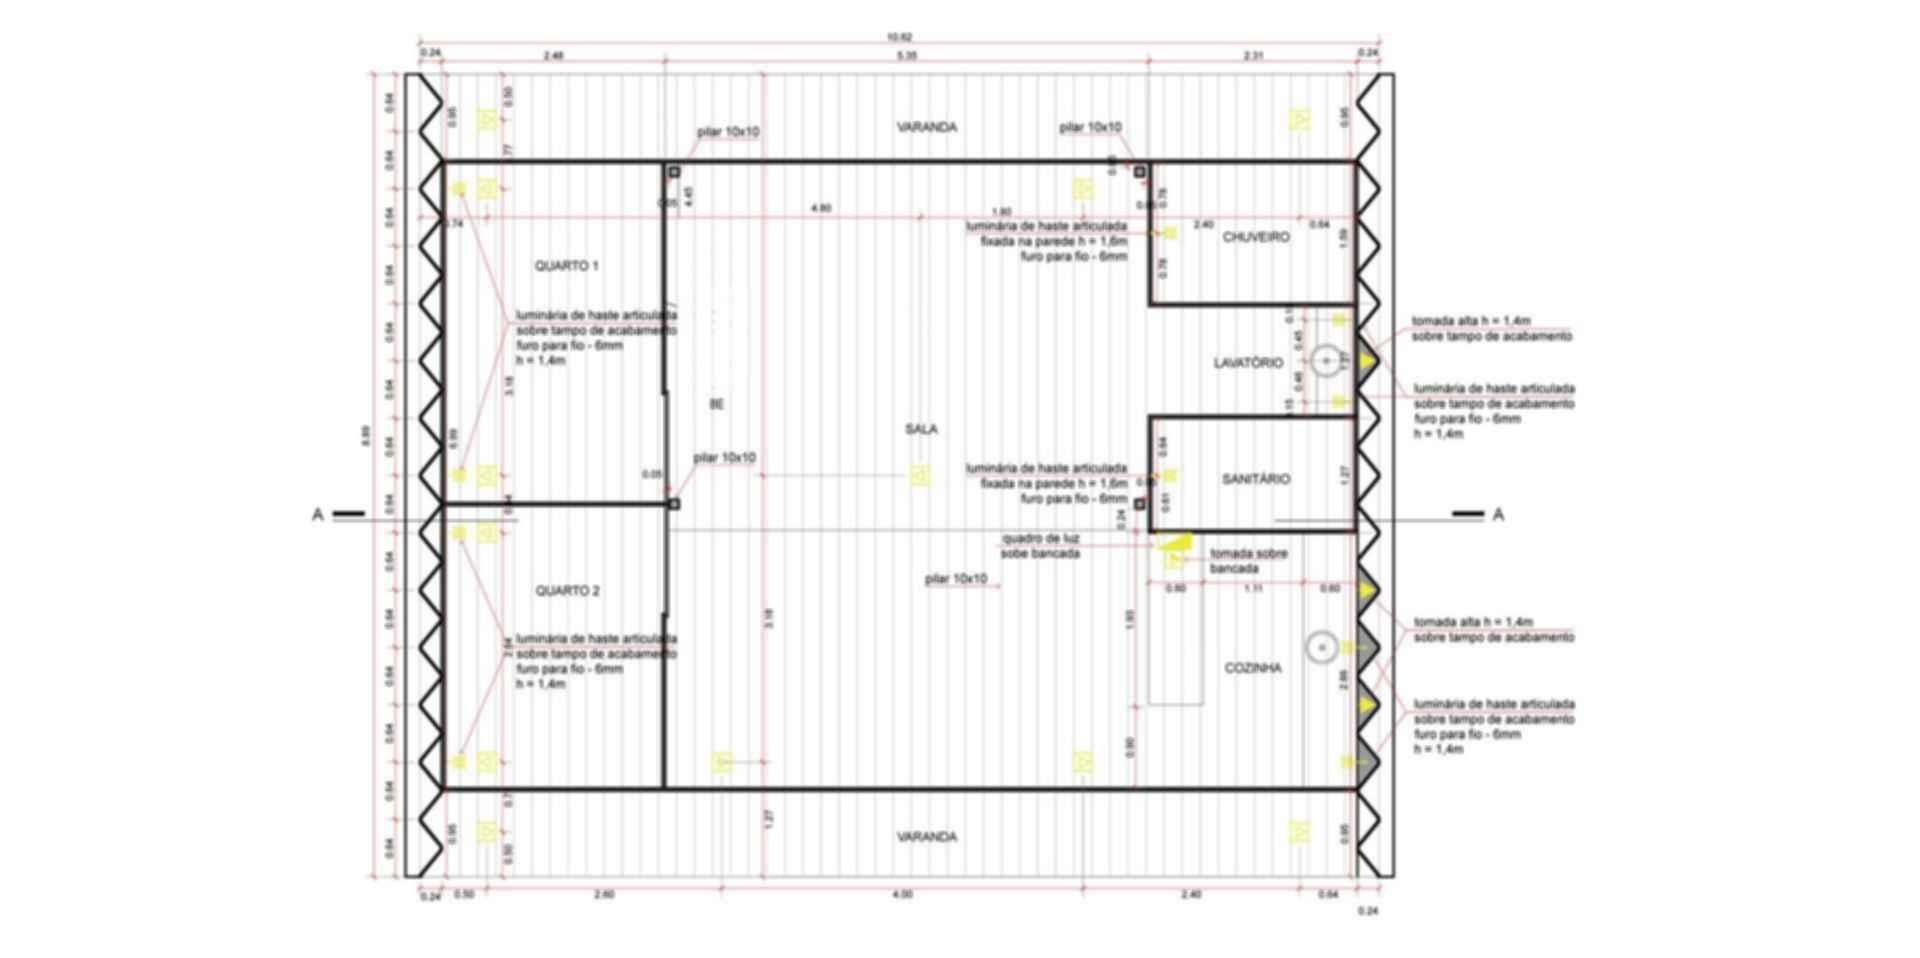 ARCA - Floor Plan